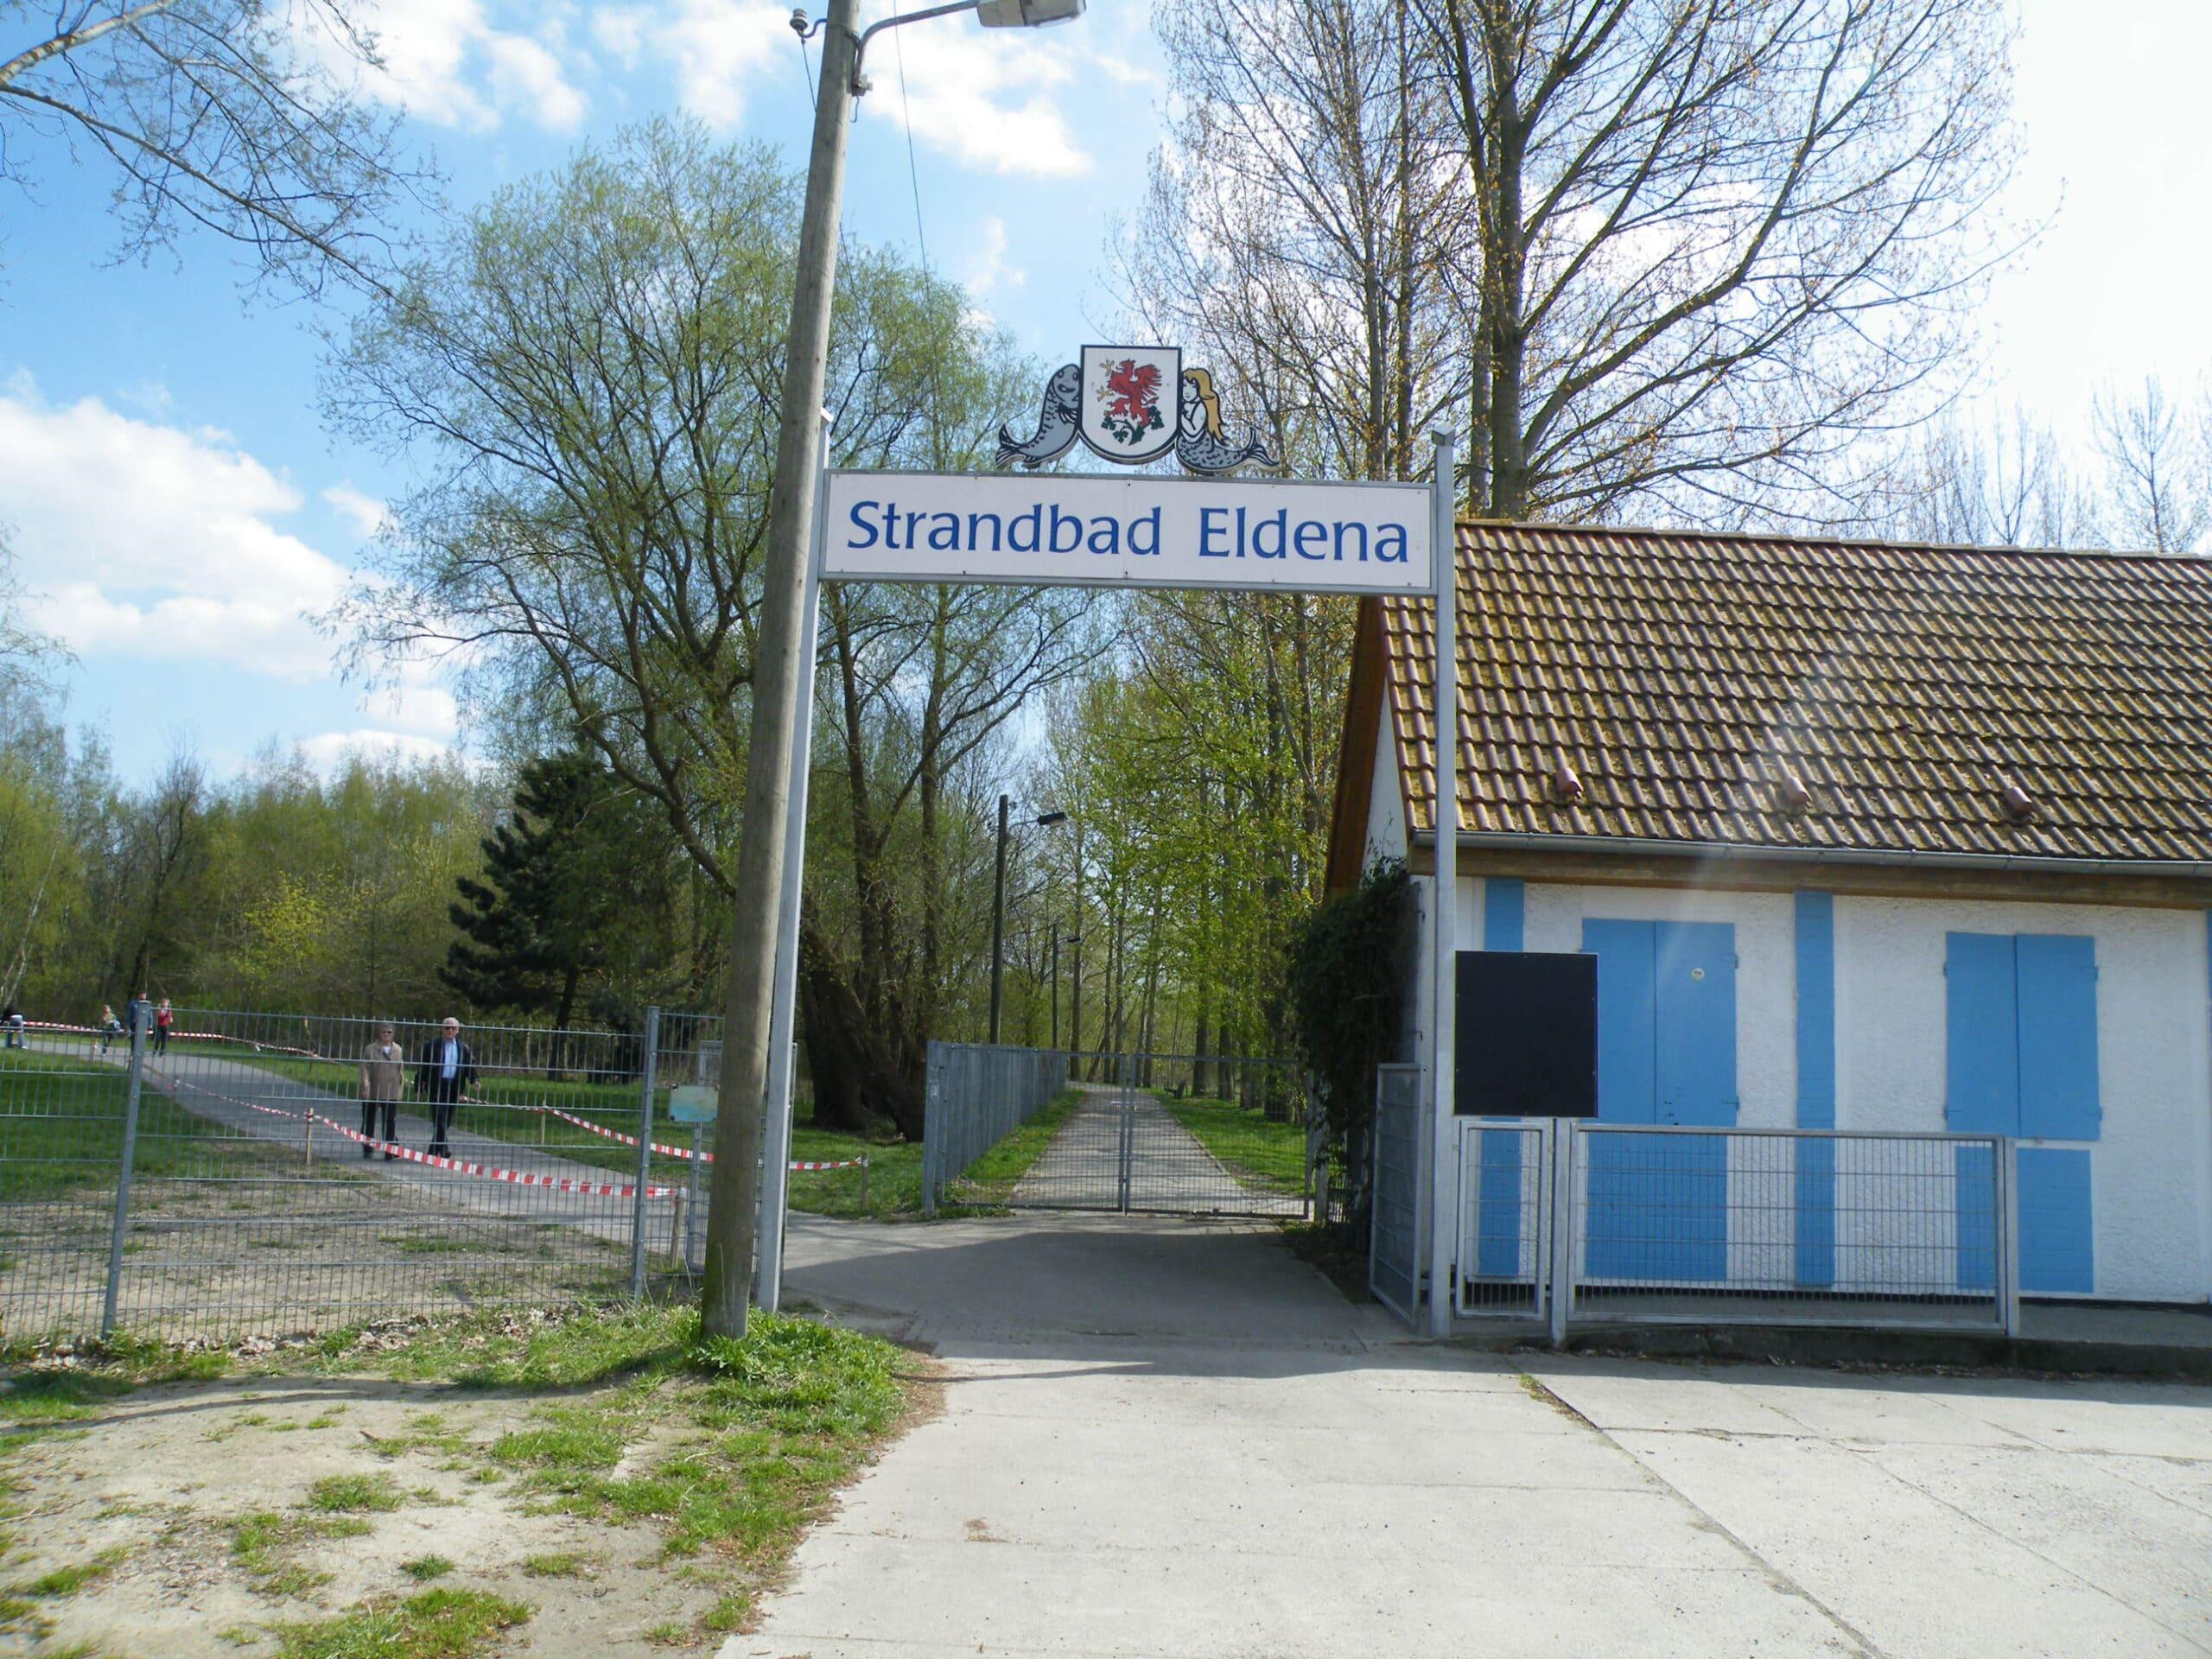 Strandbad Eldena